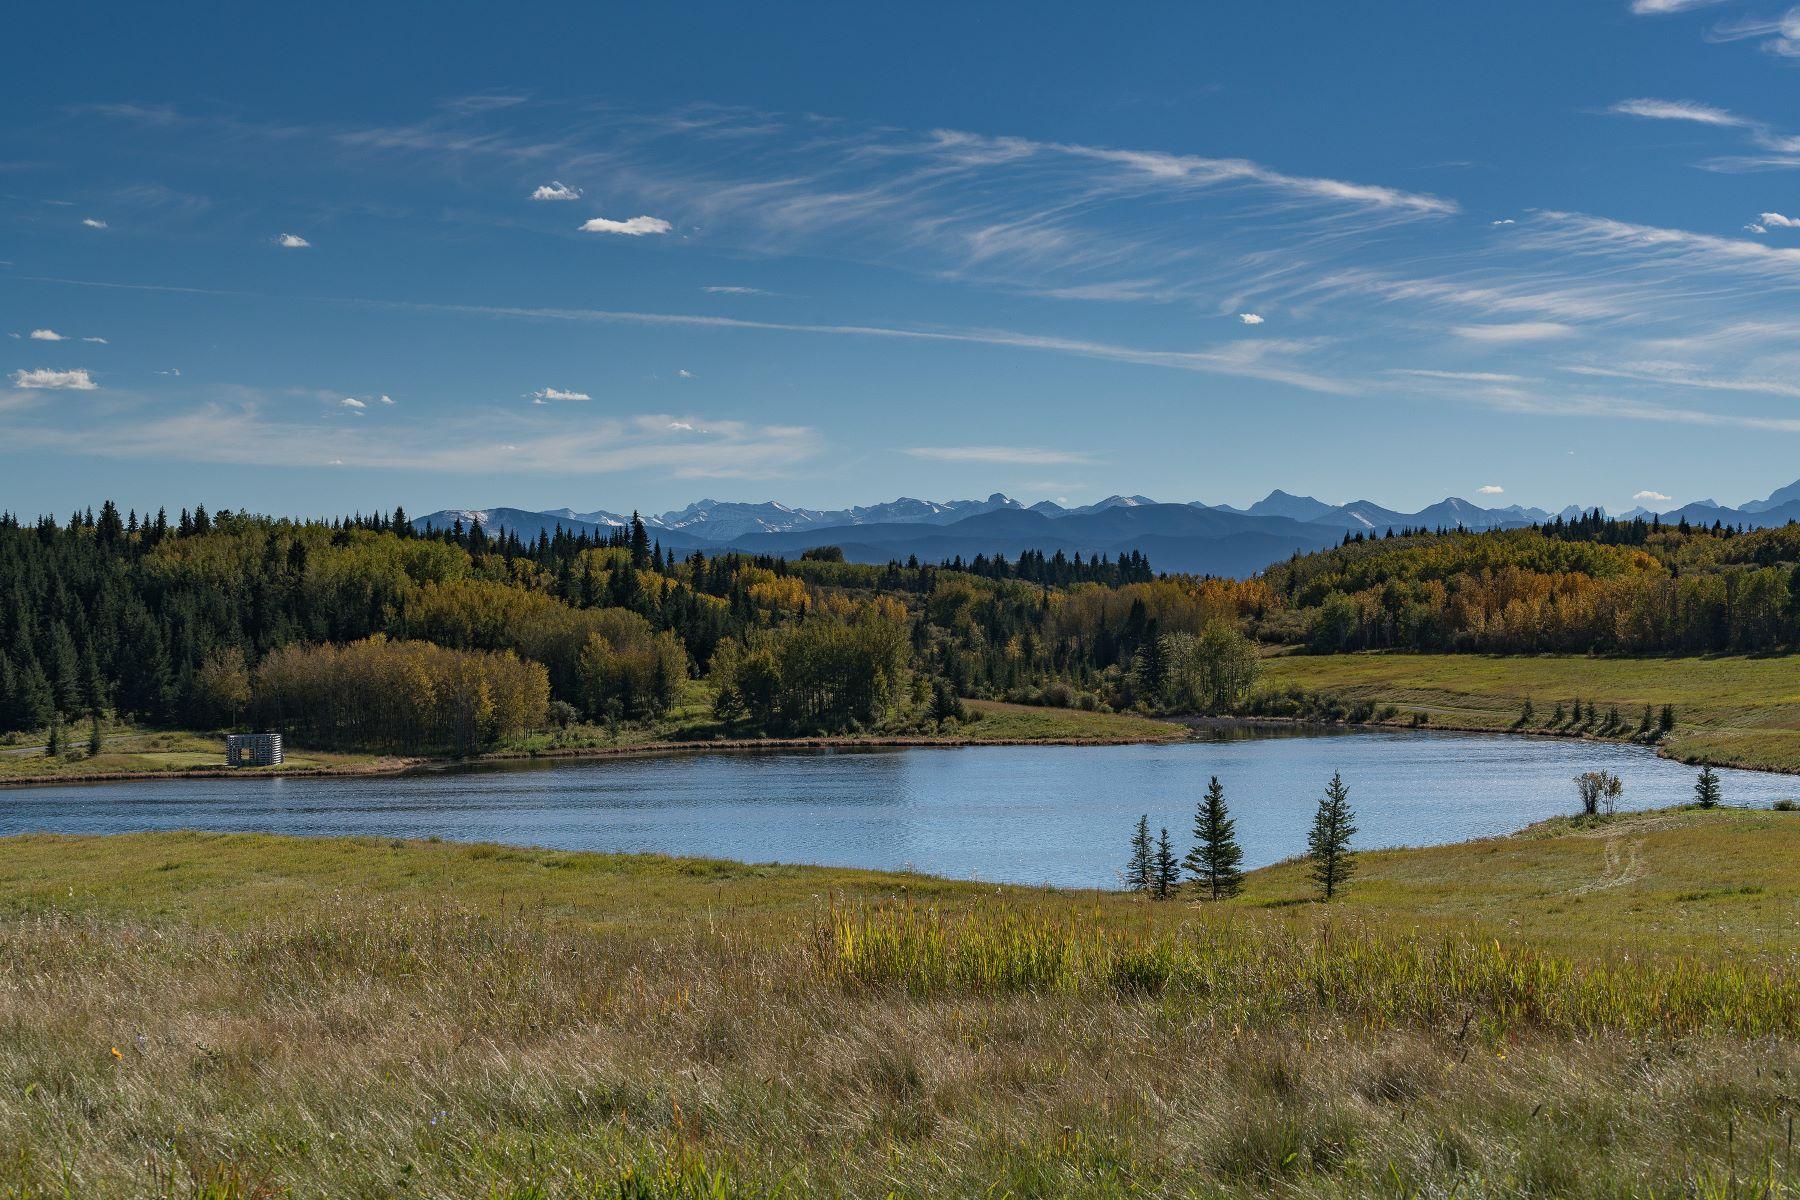 土地 為 出售 在 A Lot with Picturesque Views 12 Carraig Ridge, Ghost Lake, 阿爾伯塔, T0L 1N0 加拿大